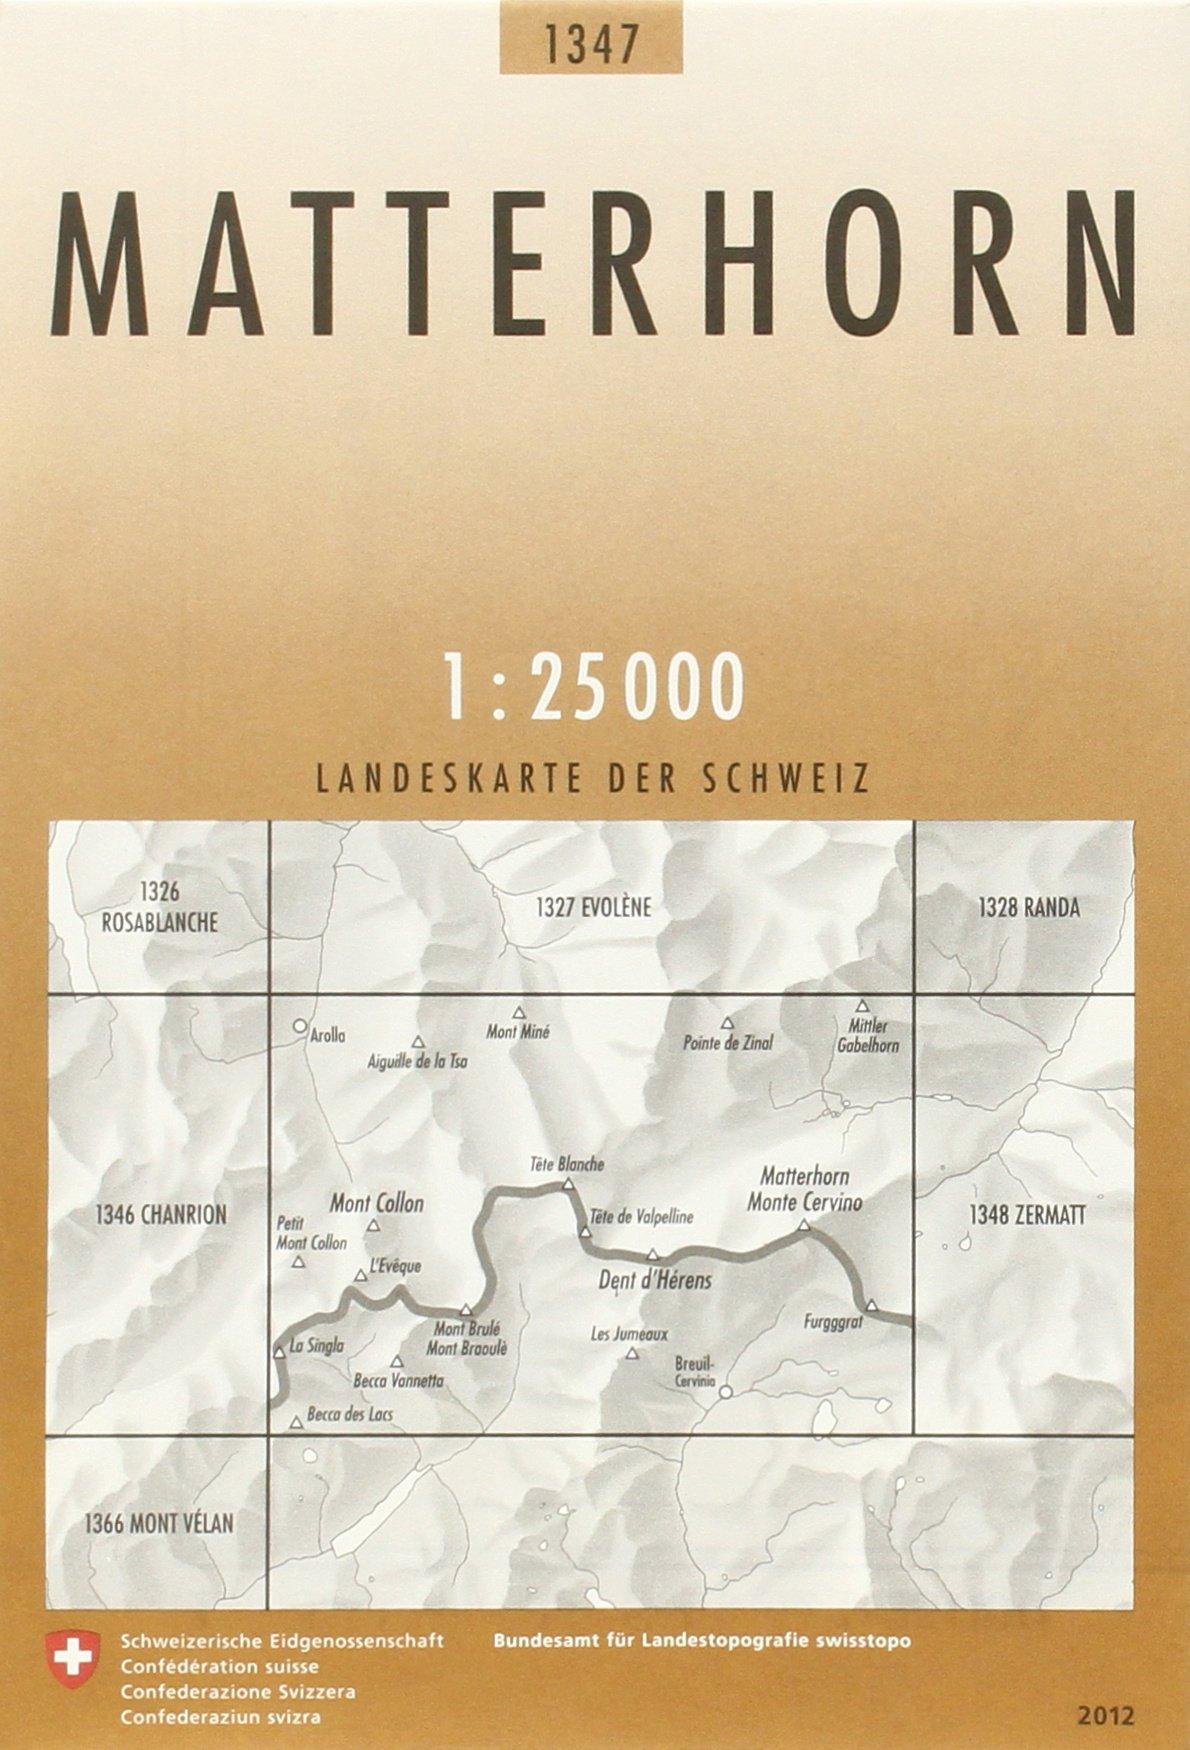 Swisstopo 1 : 25 000 Matterhorn (Landeskarte Der Schweiz)